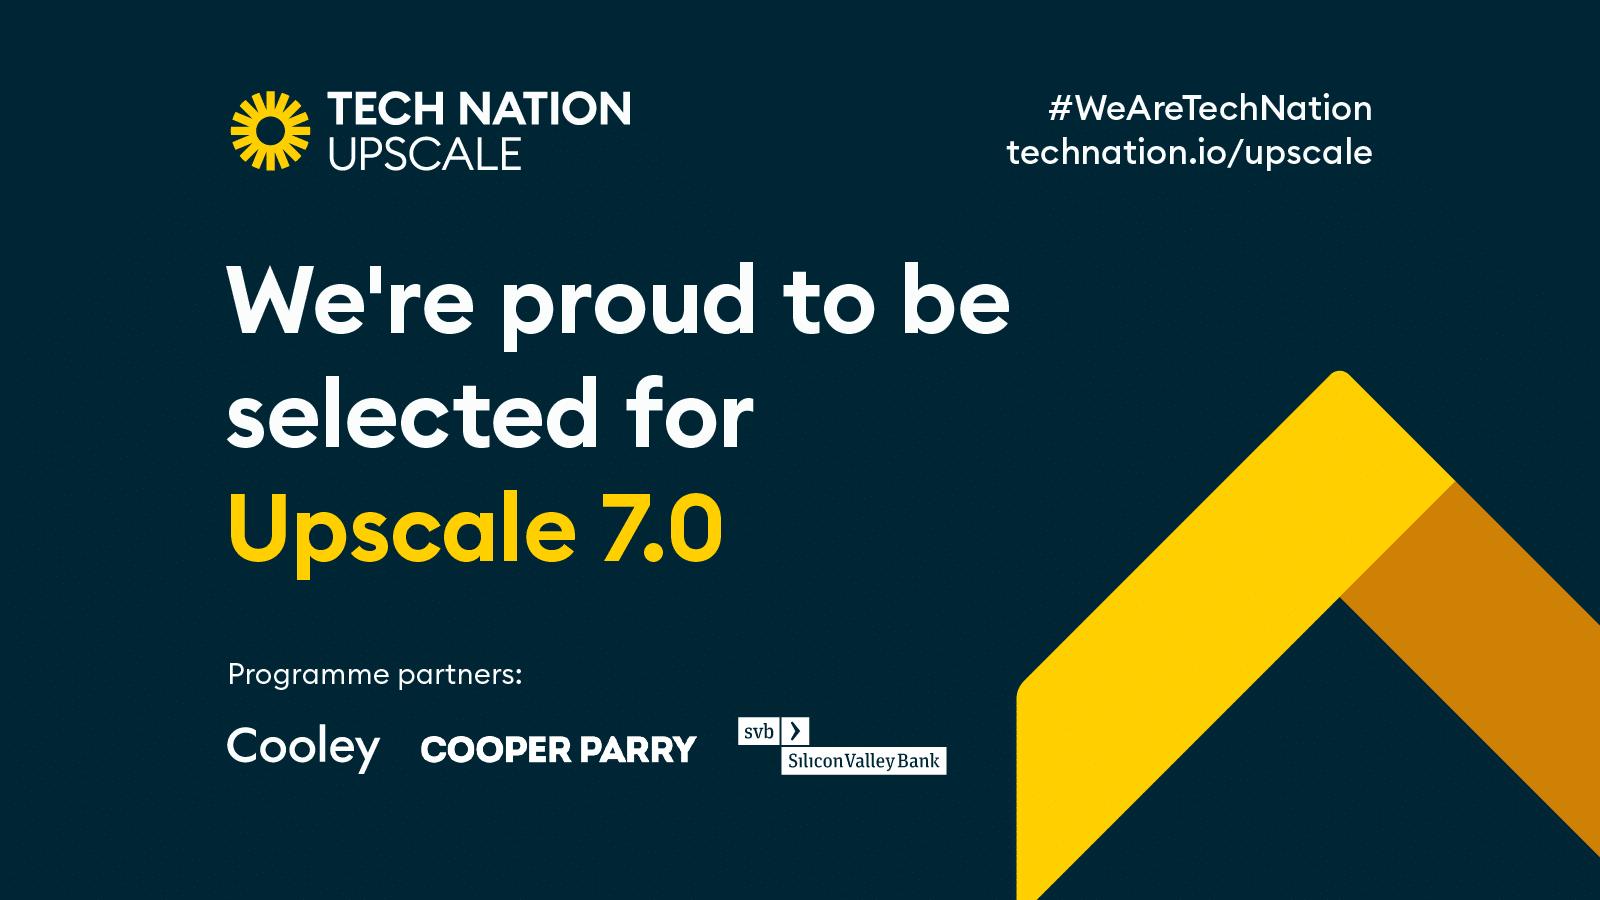 TechNation Upscale 7.0 Banner